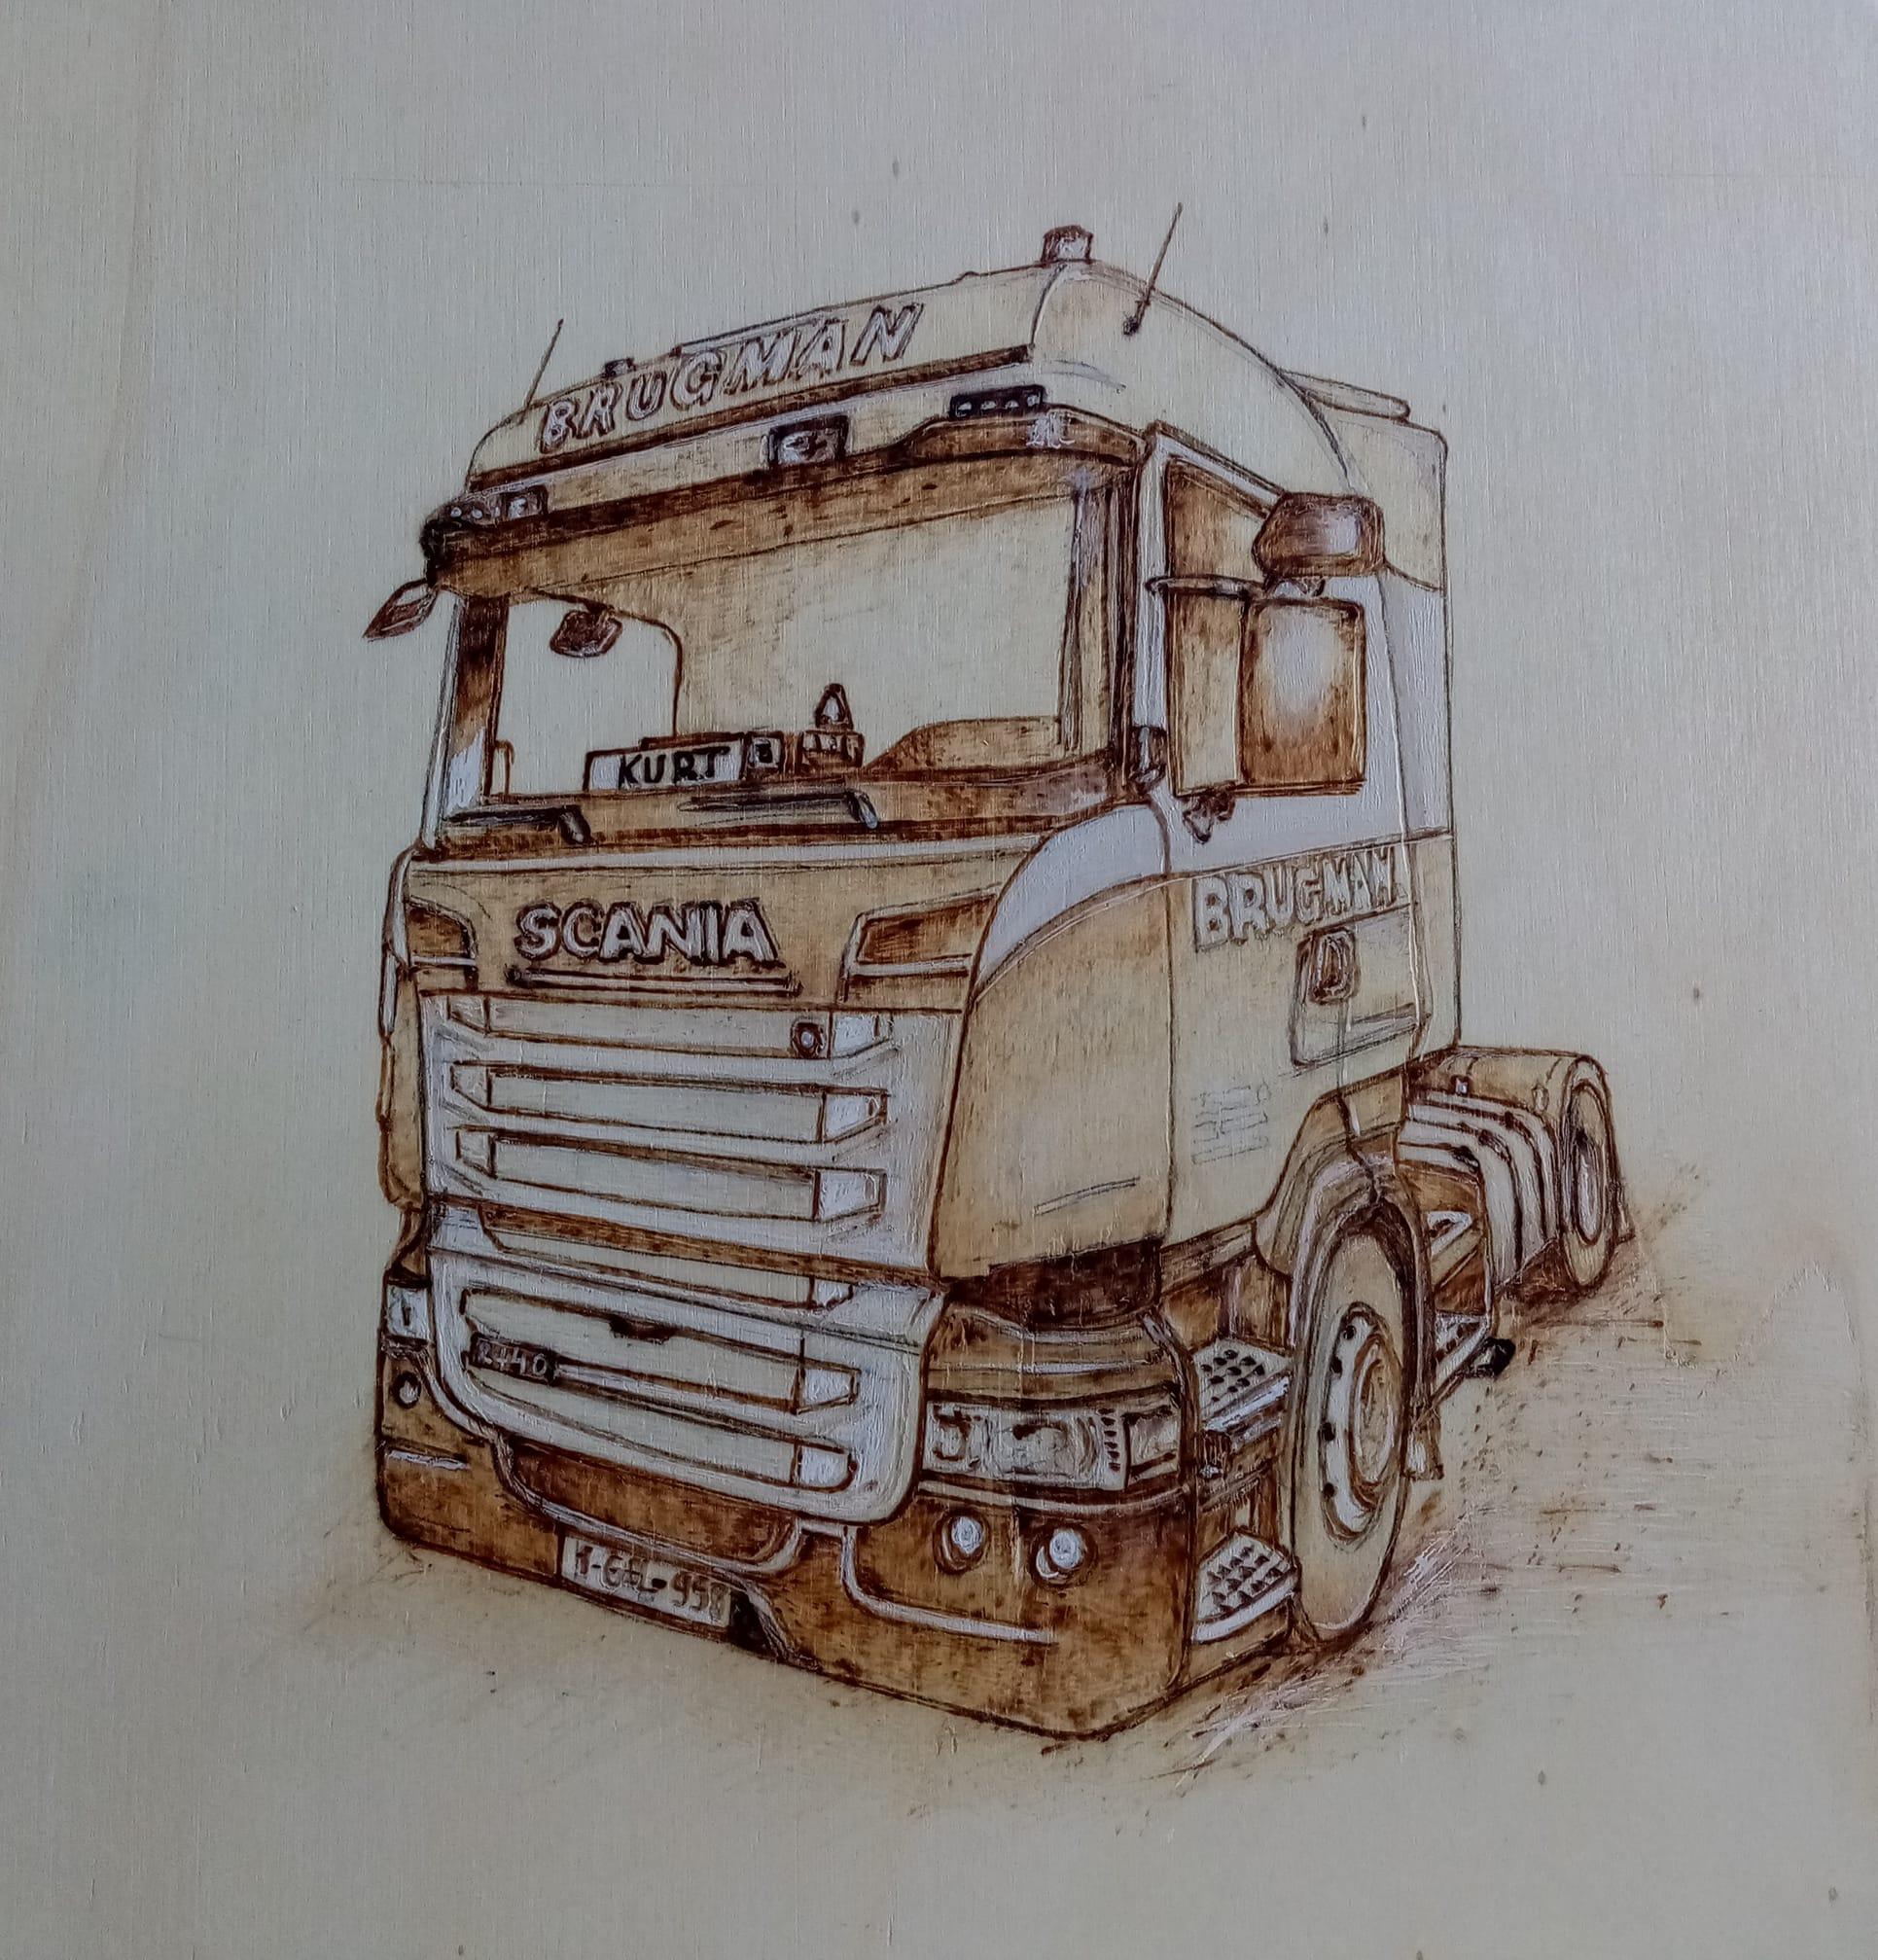 Scania-Brugman